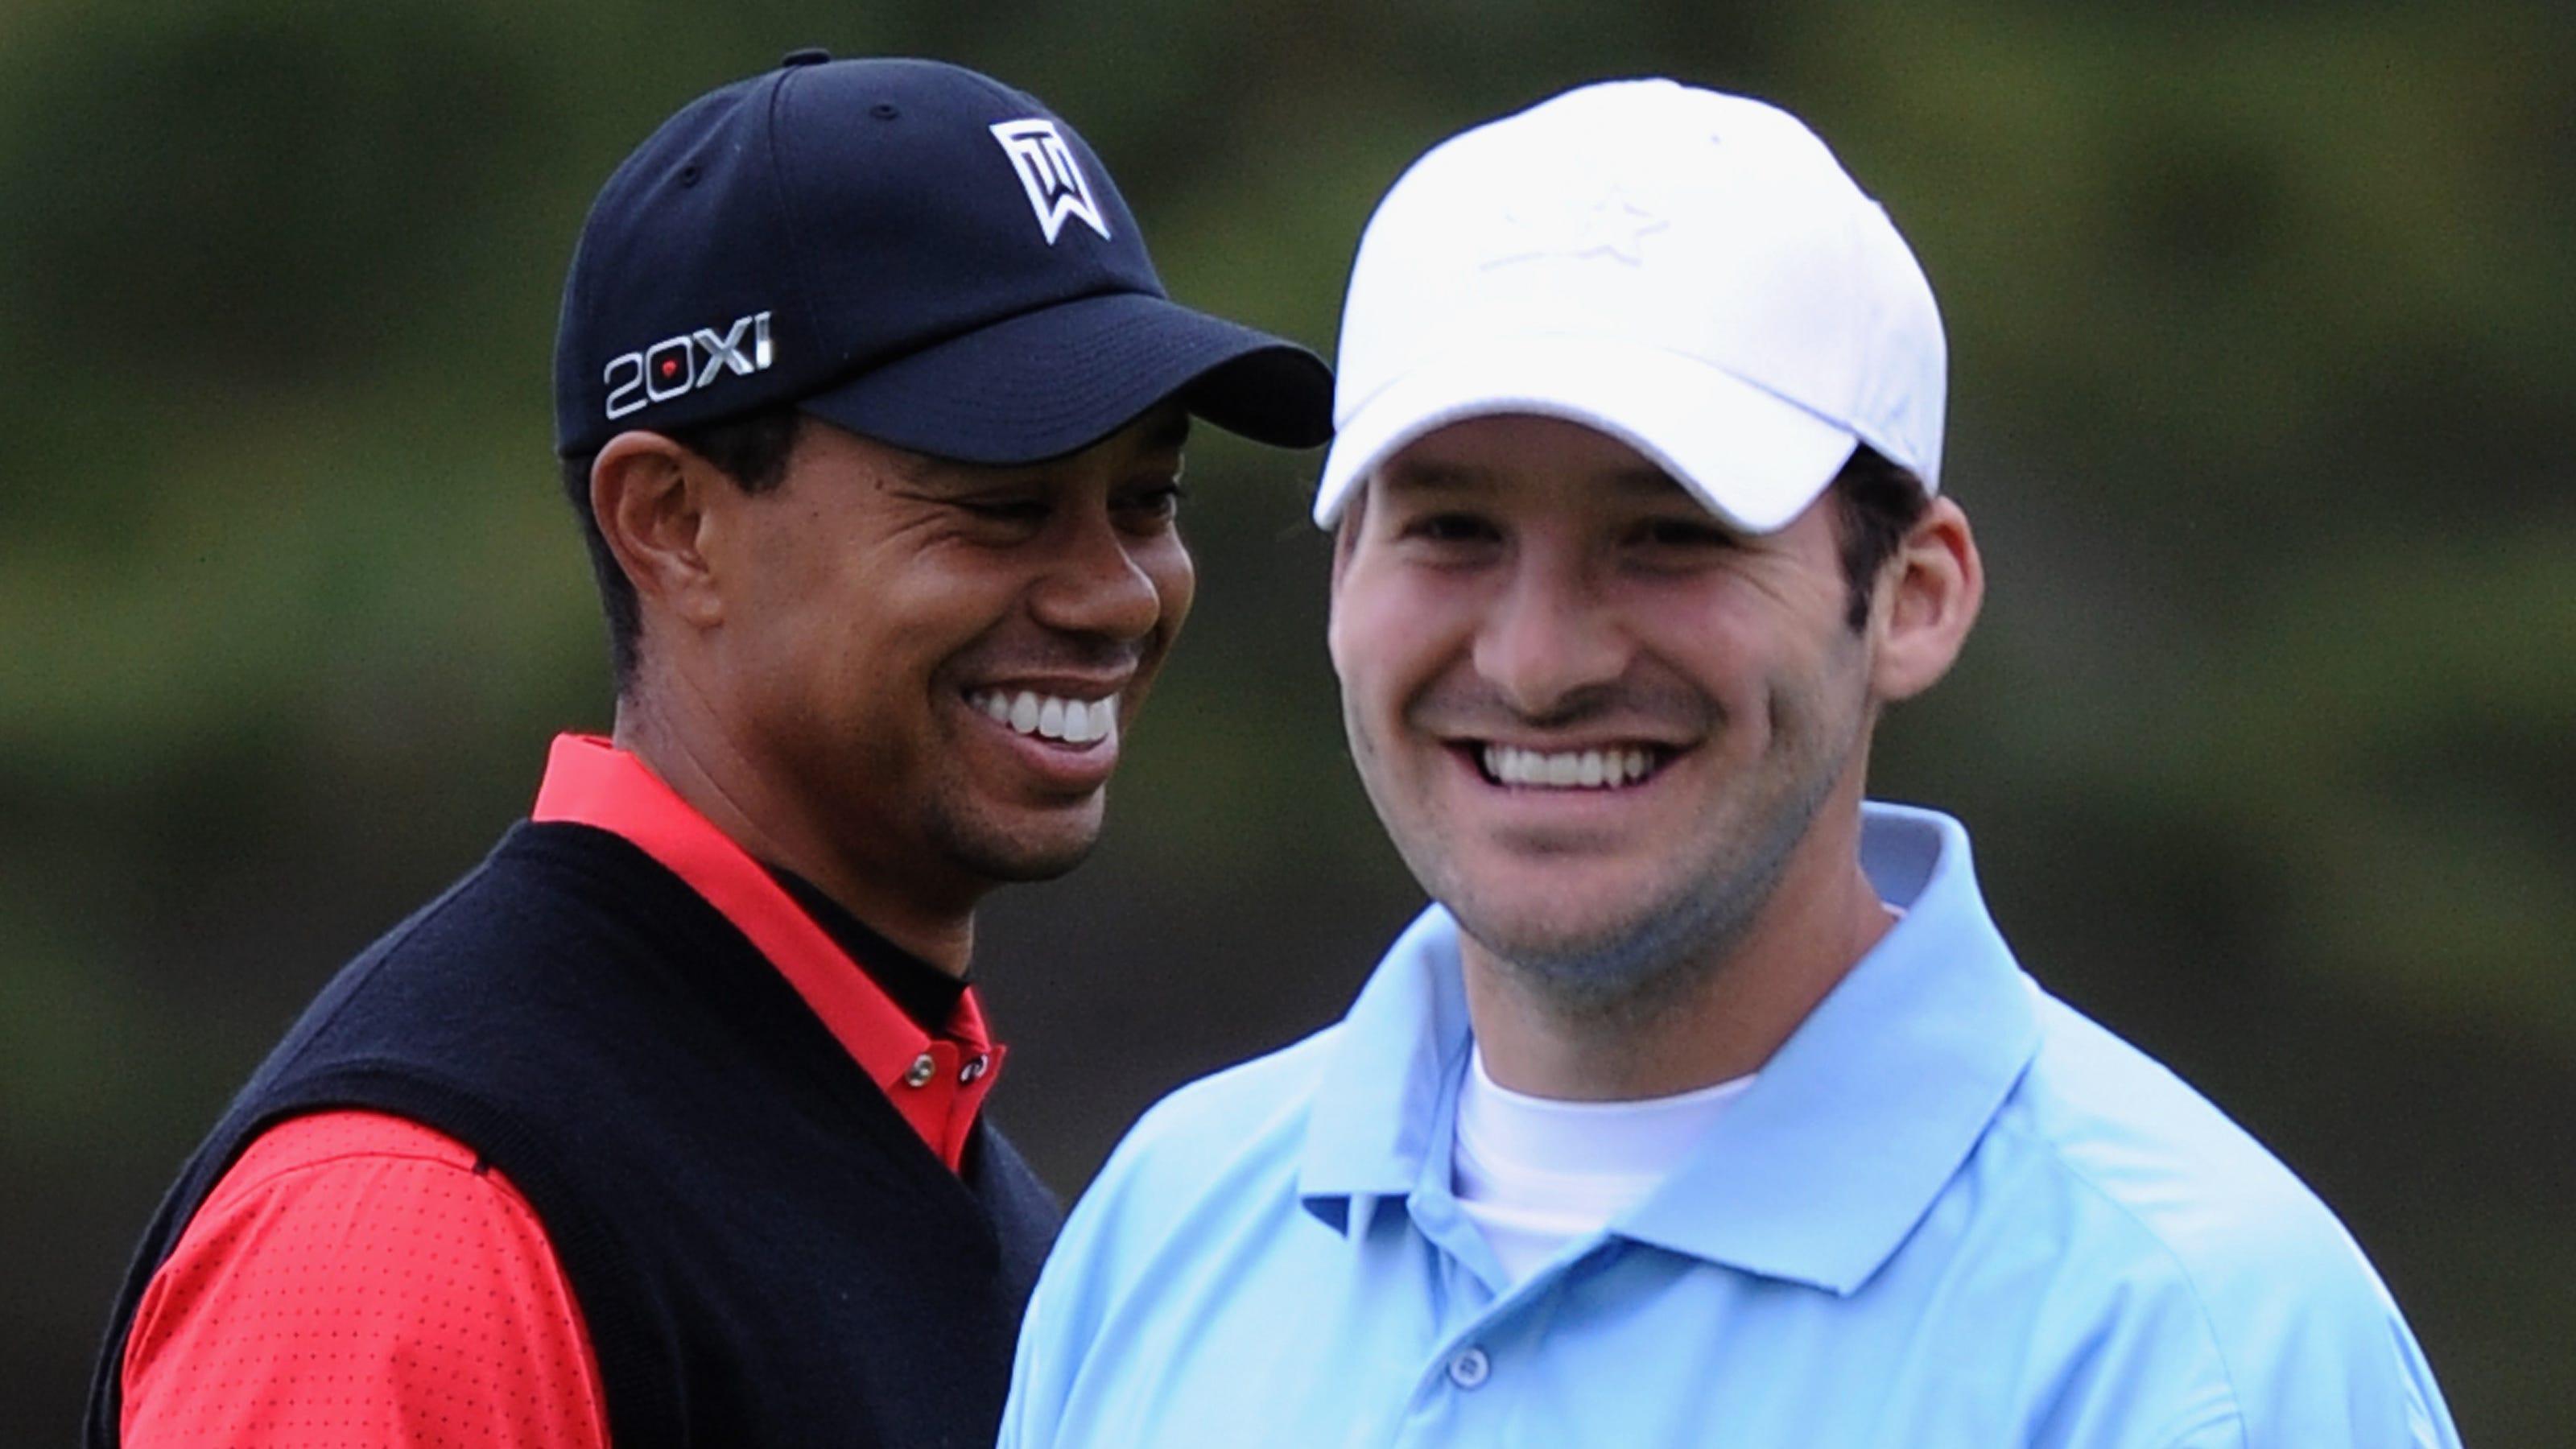 Curse Tony Romo for agreeing to play in PGA Tour's Byron Nelson| Opinion - Detroit Free Press